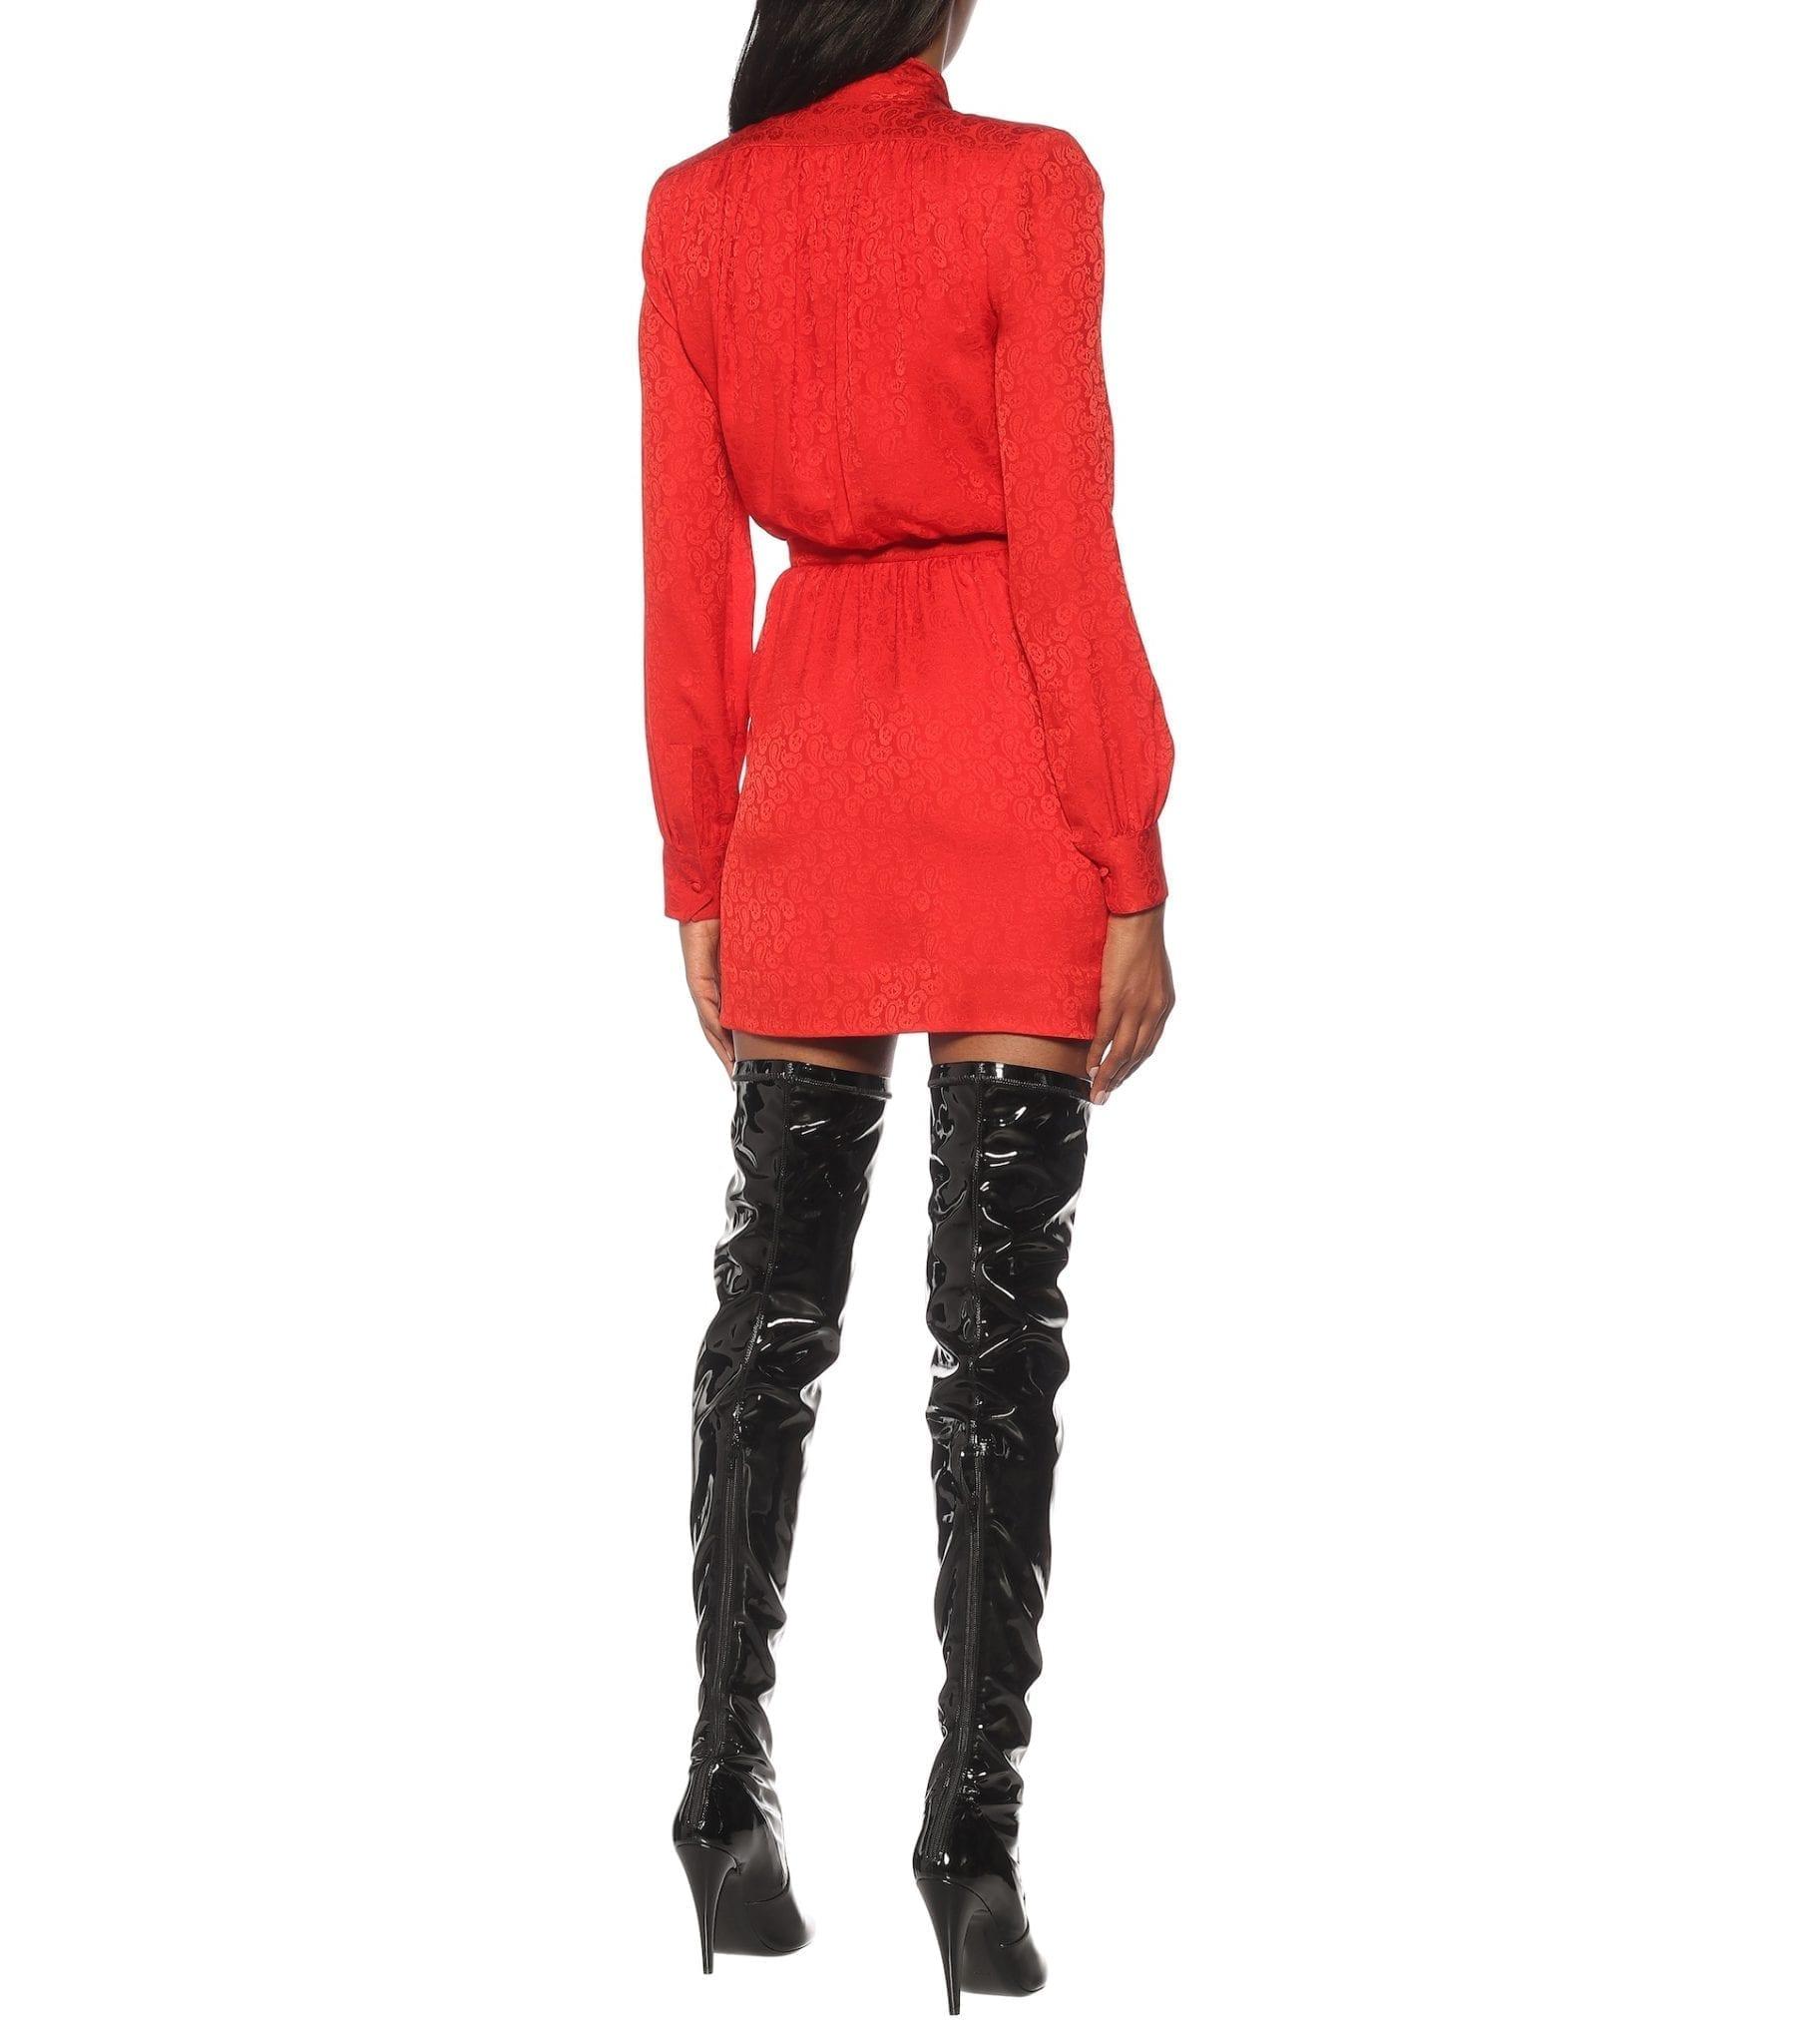 SAINT LAURENT Tie-neck Jacquard Silk Mini Dress